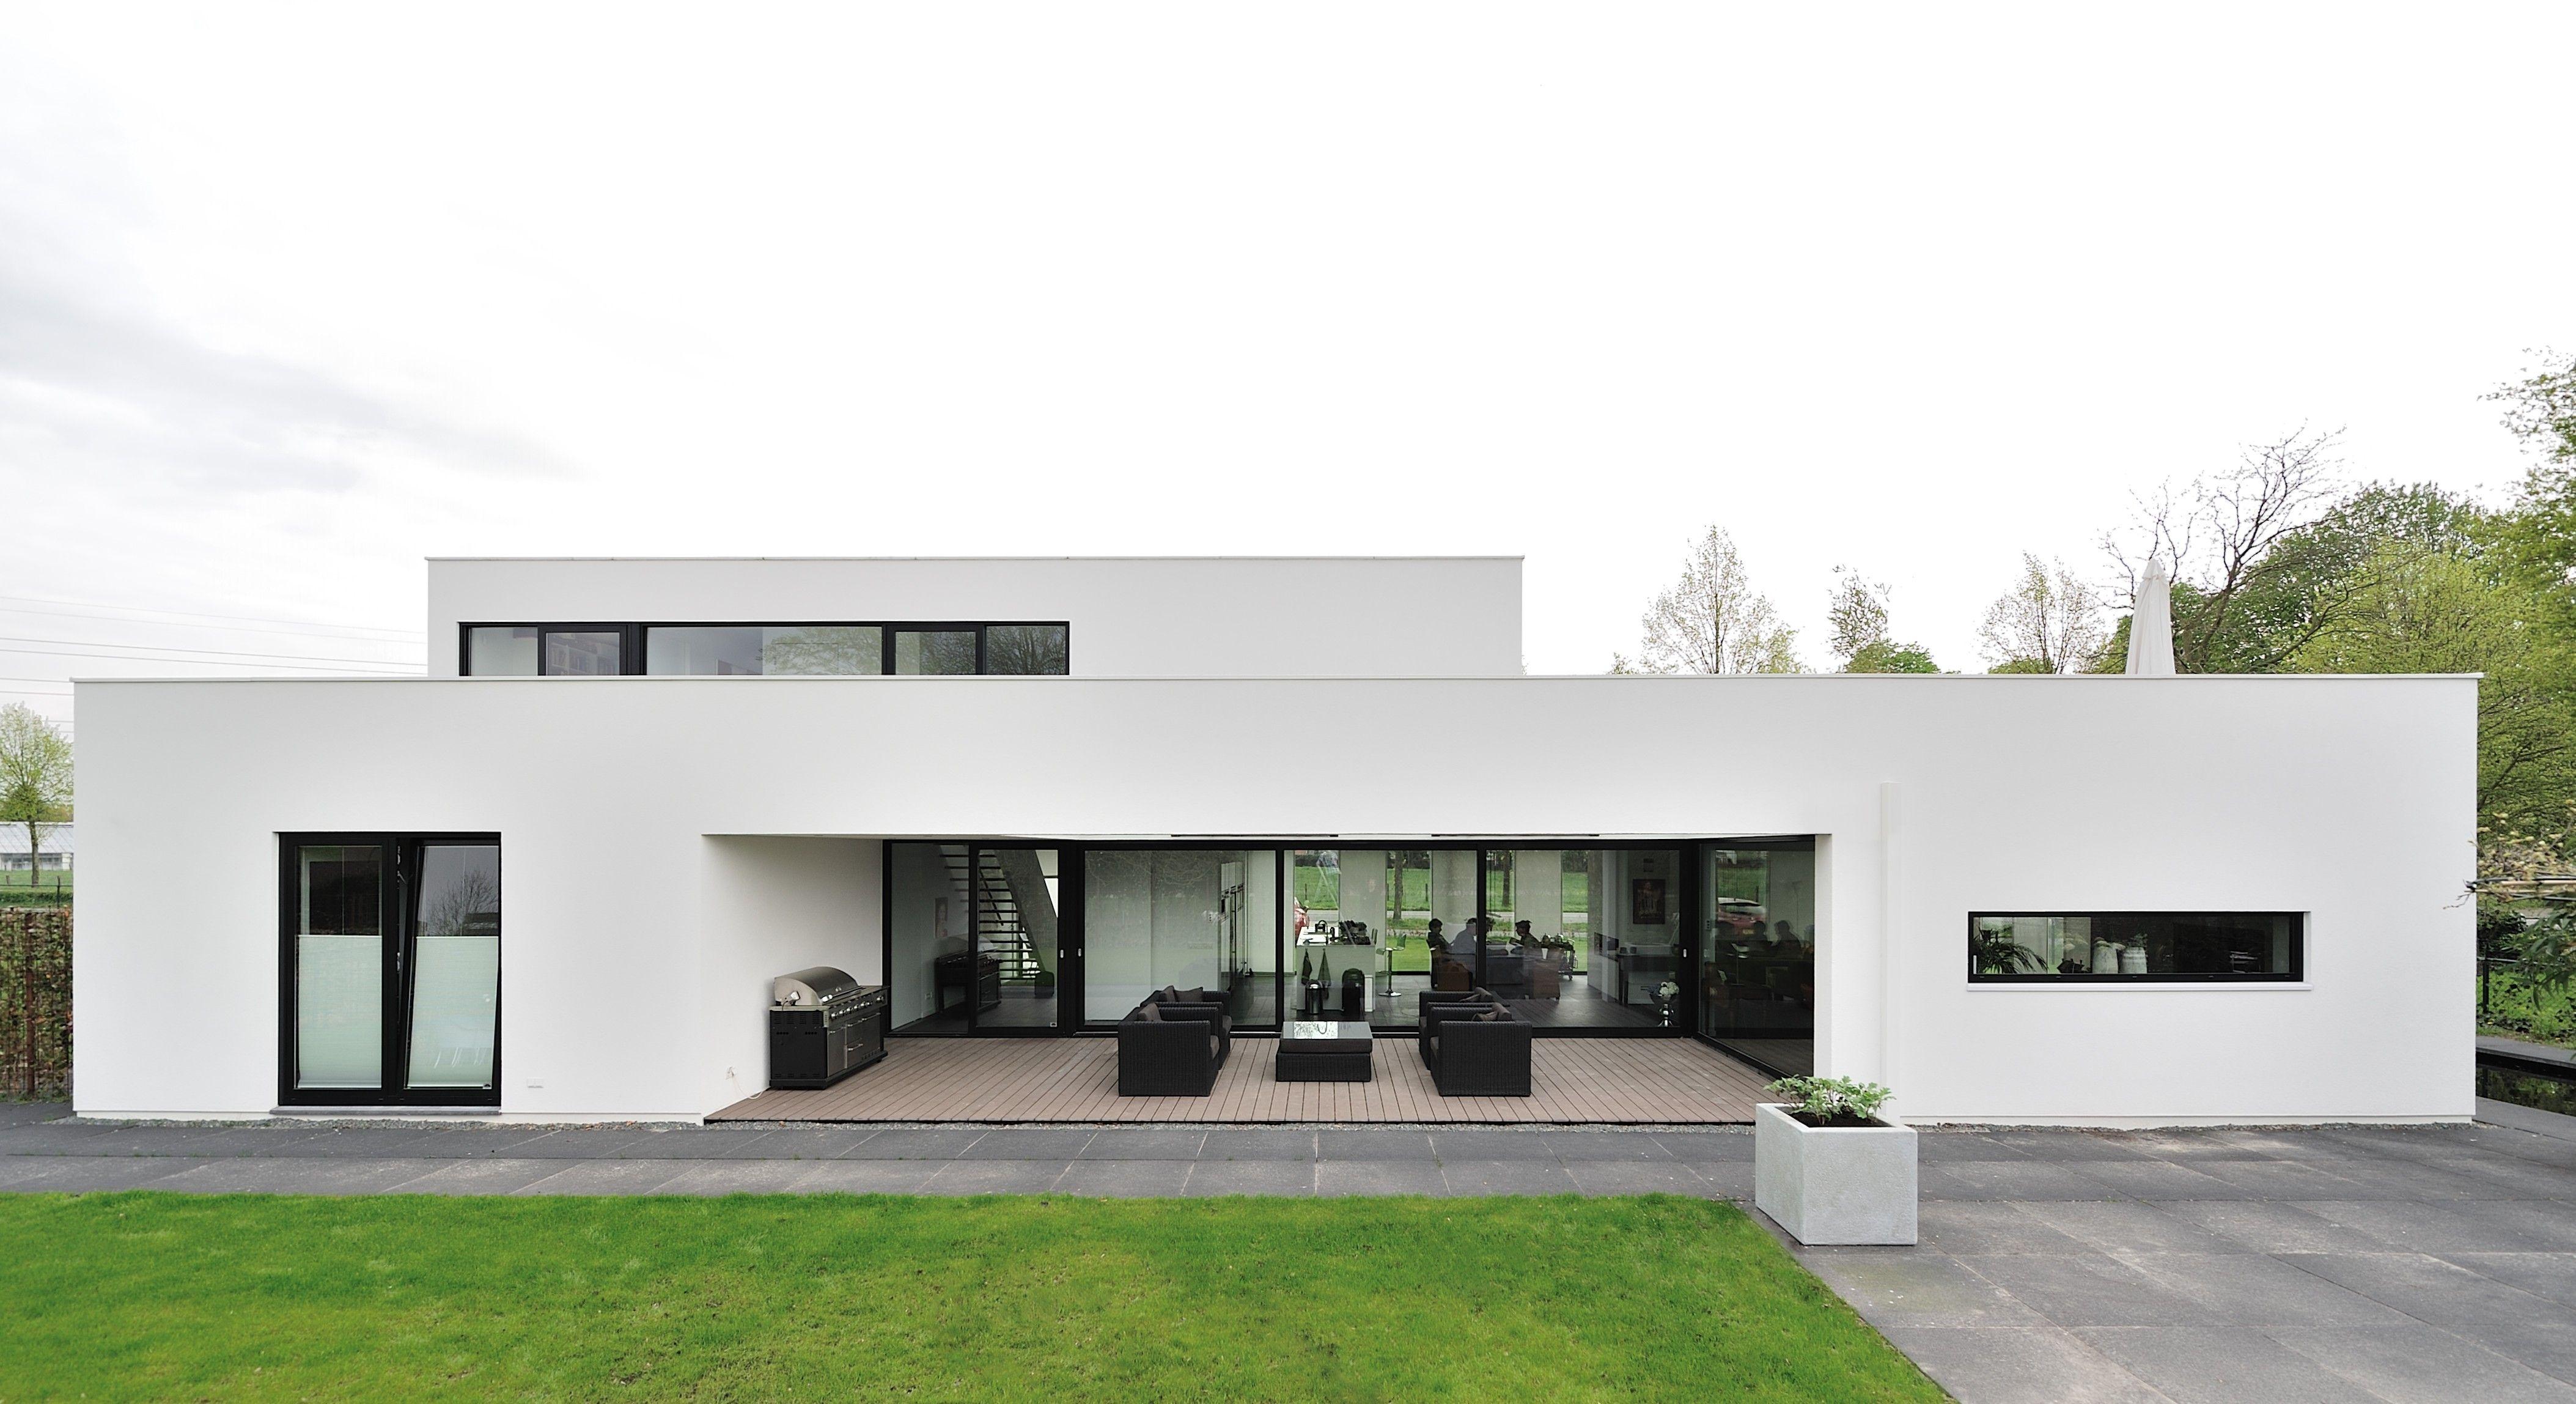 15 Best Contemporary Villa Board Images On Pinterest - Modern